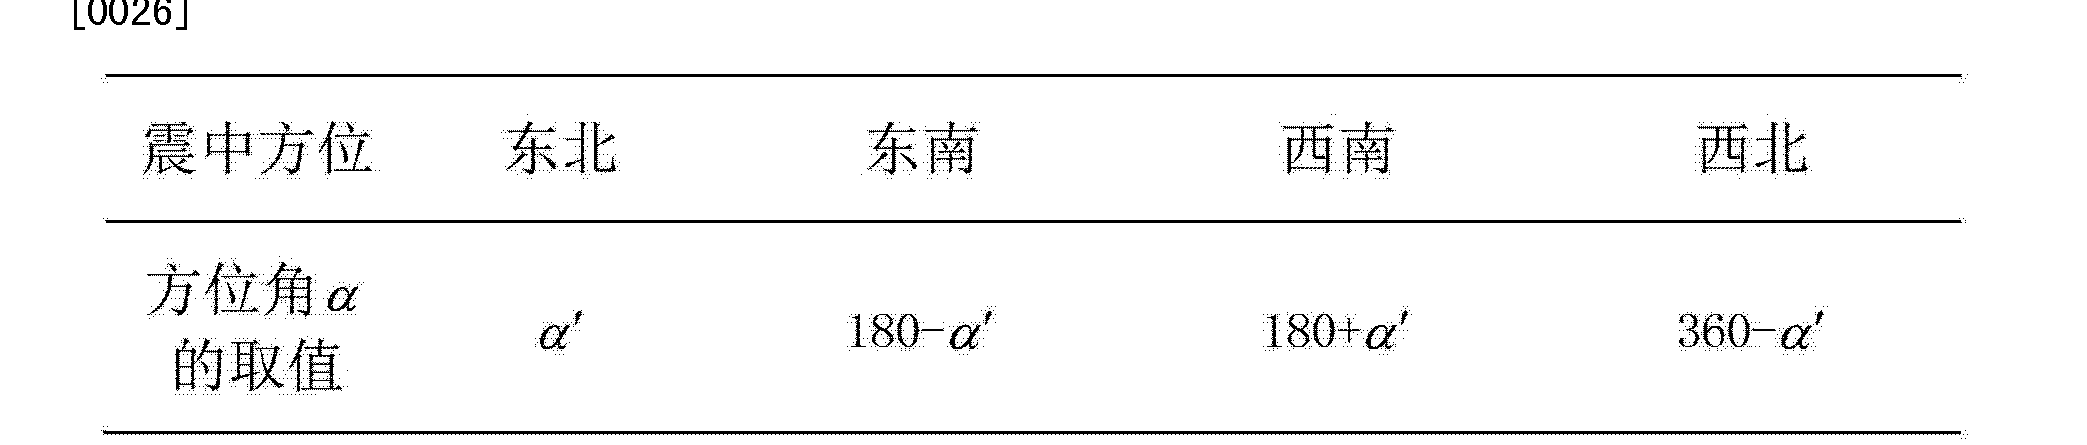 Figure CN103336299AD00061